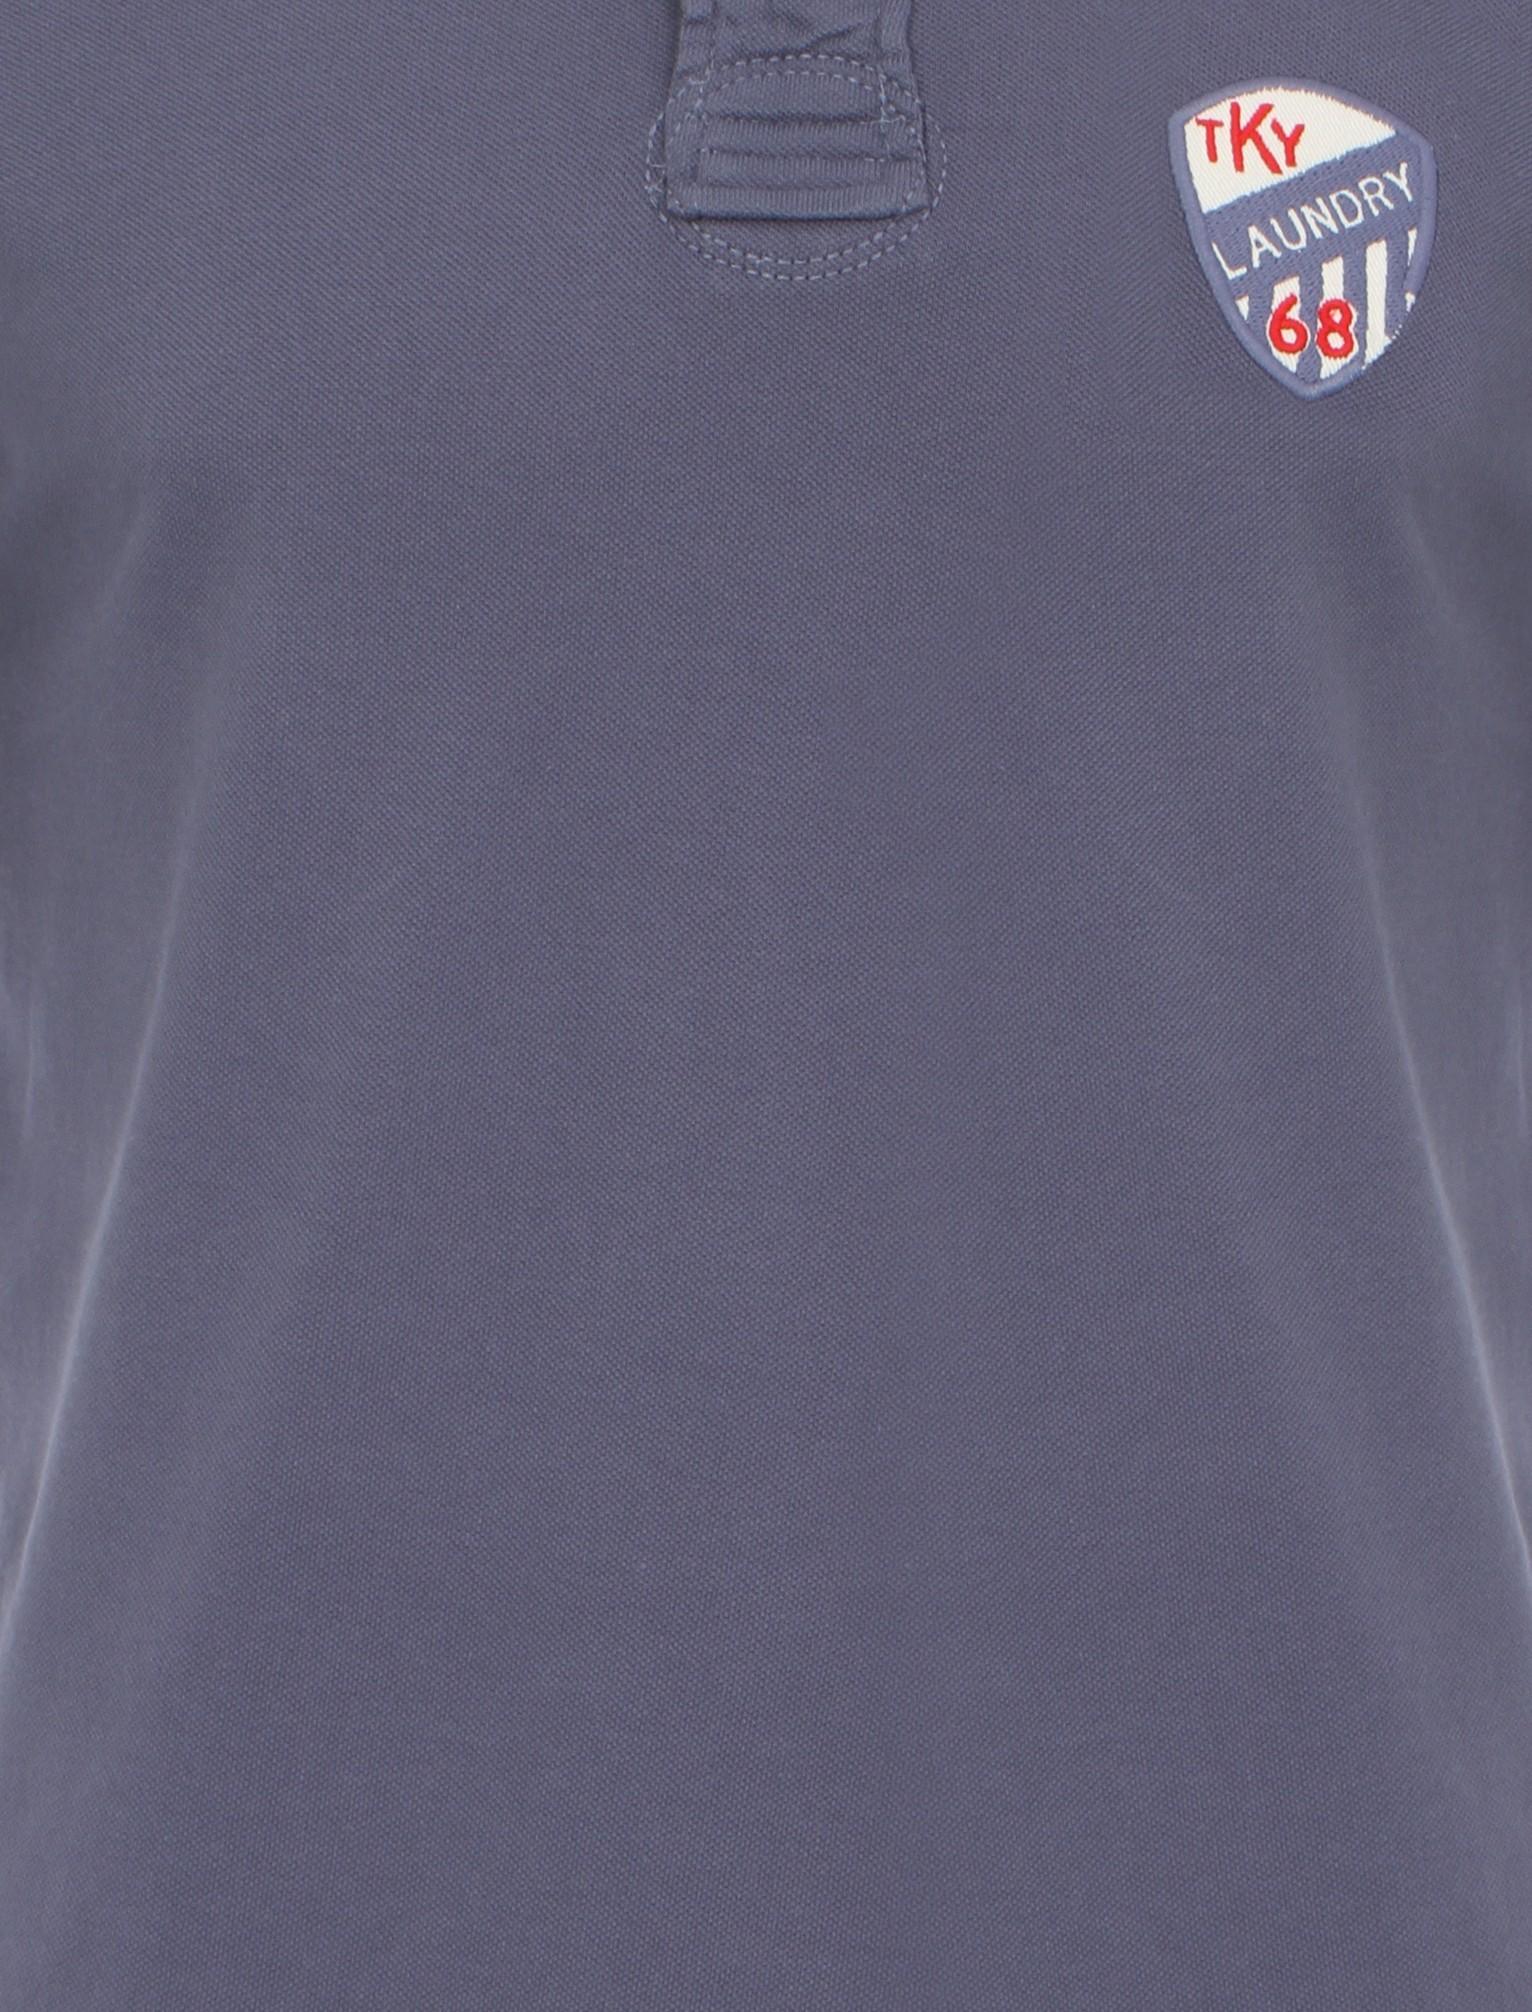 Herren-Tokyo-Laundry-Thompson-Polo-Hemd-Groesse-S-XXL